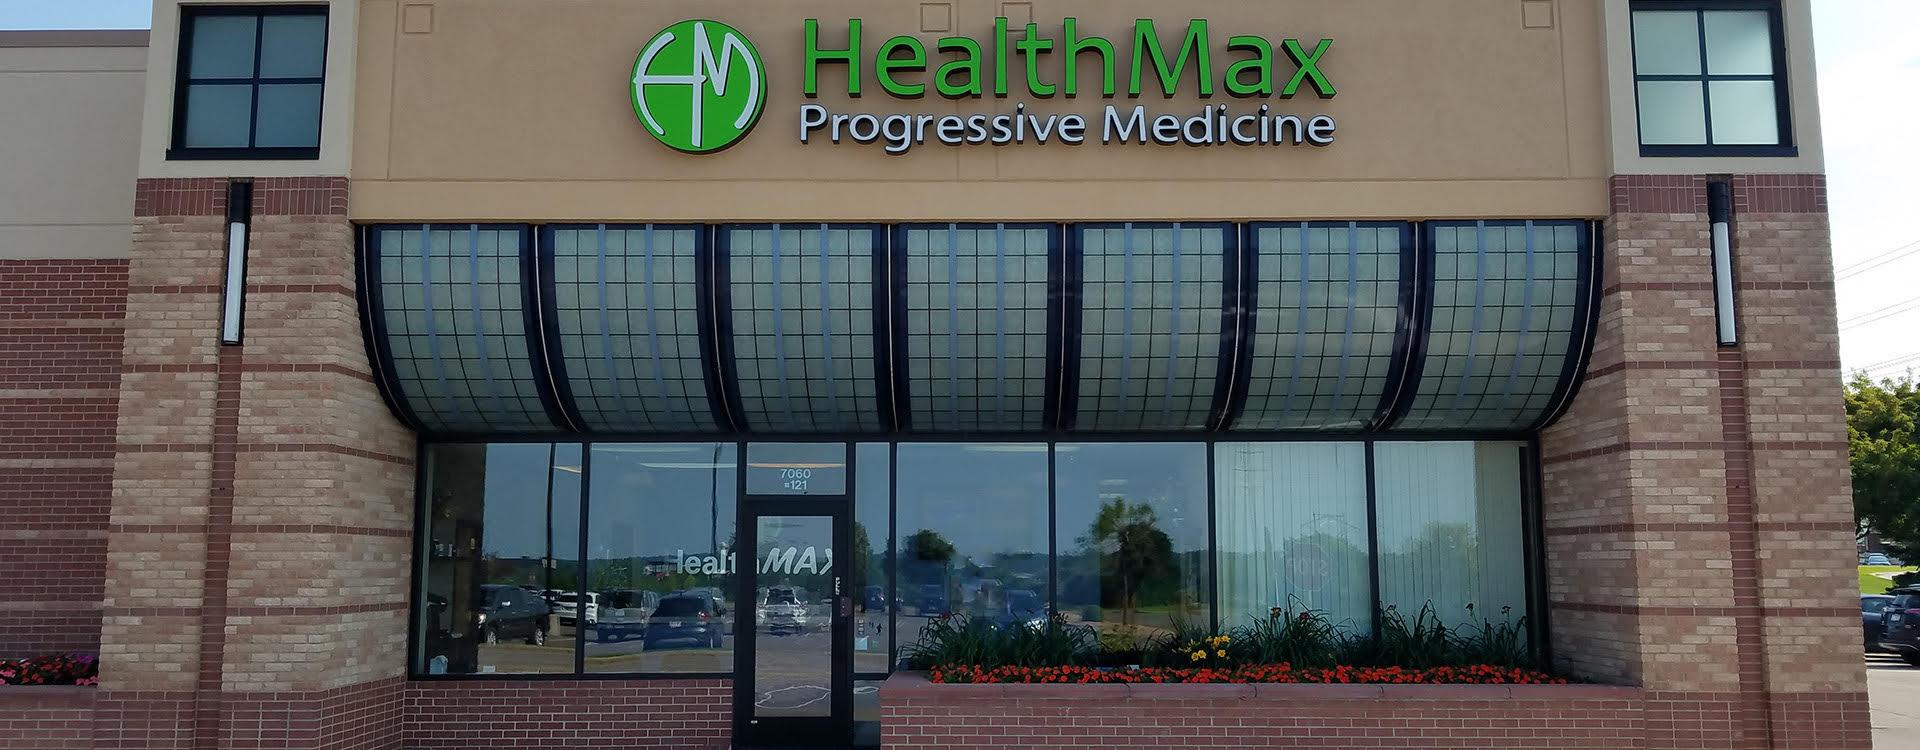 HealthMax Progressive Medicine